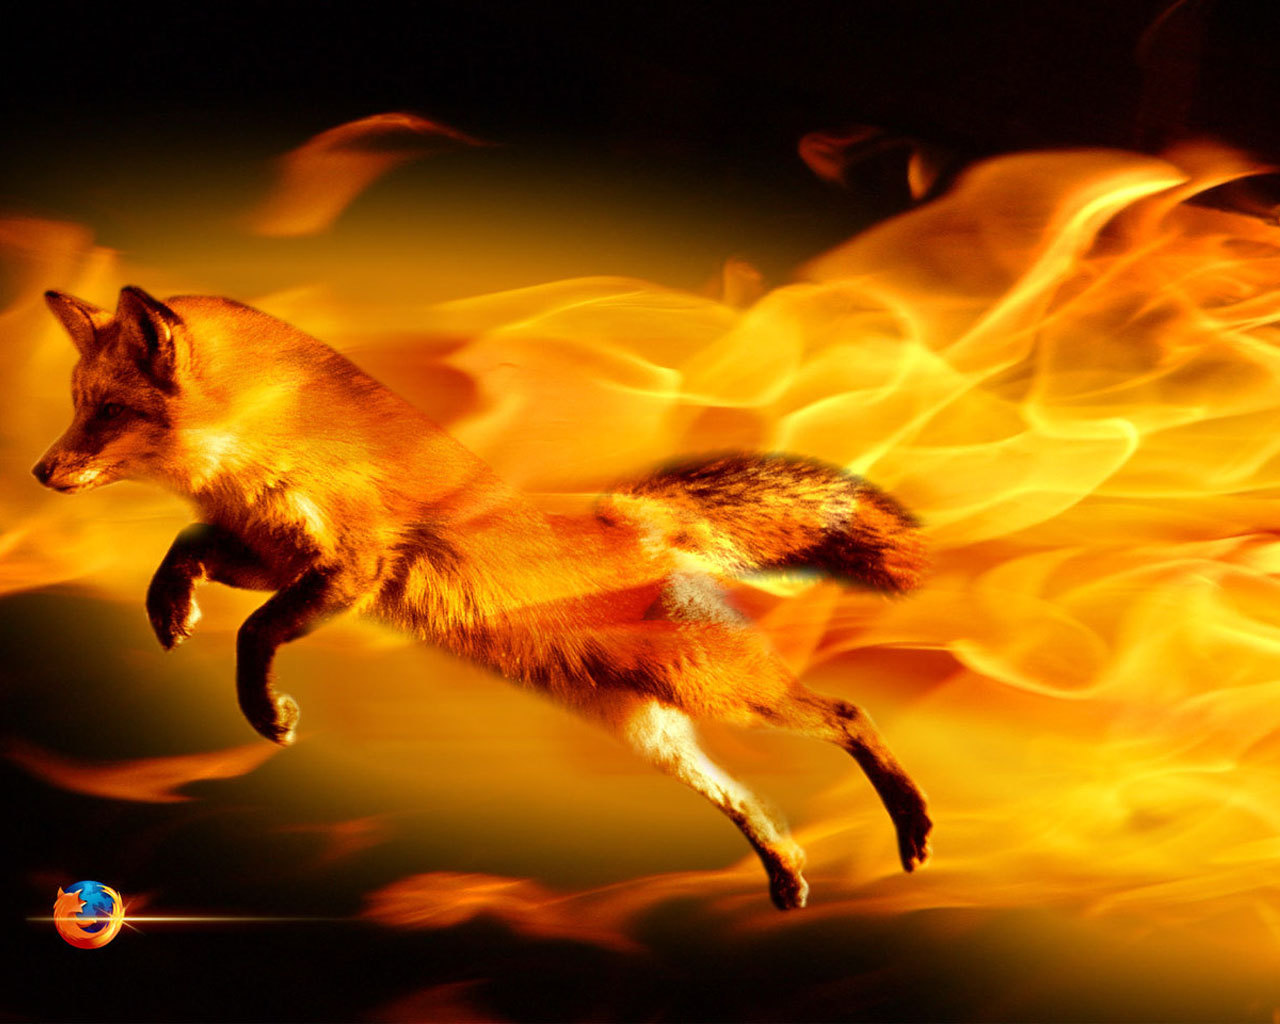 HD WALLPAPER 1080p: 3D HD FIRE WALLPAPER 1080p